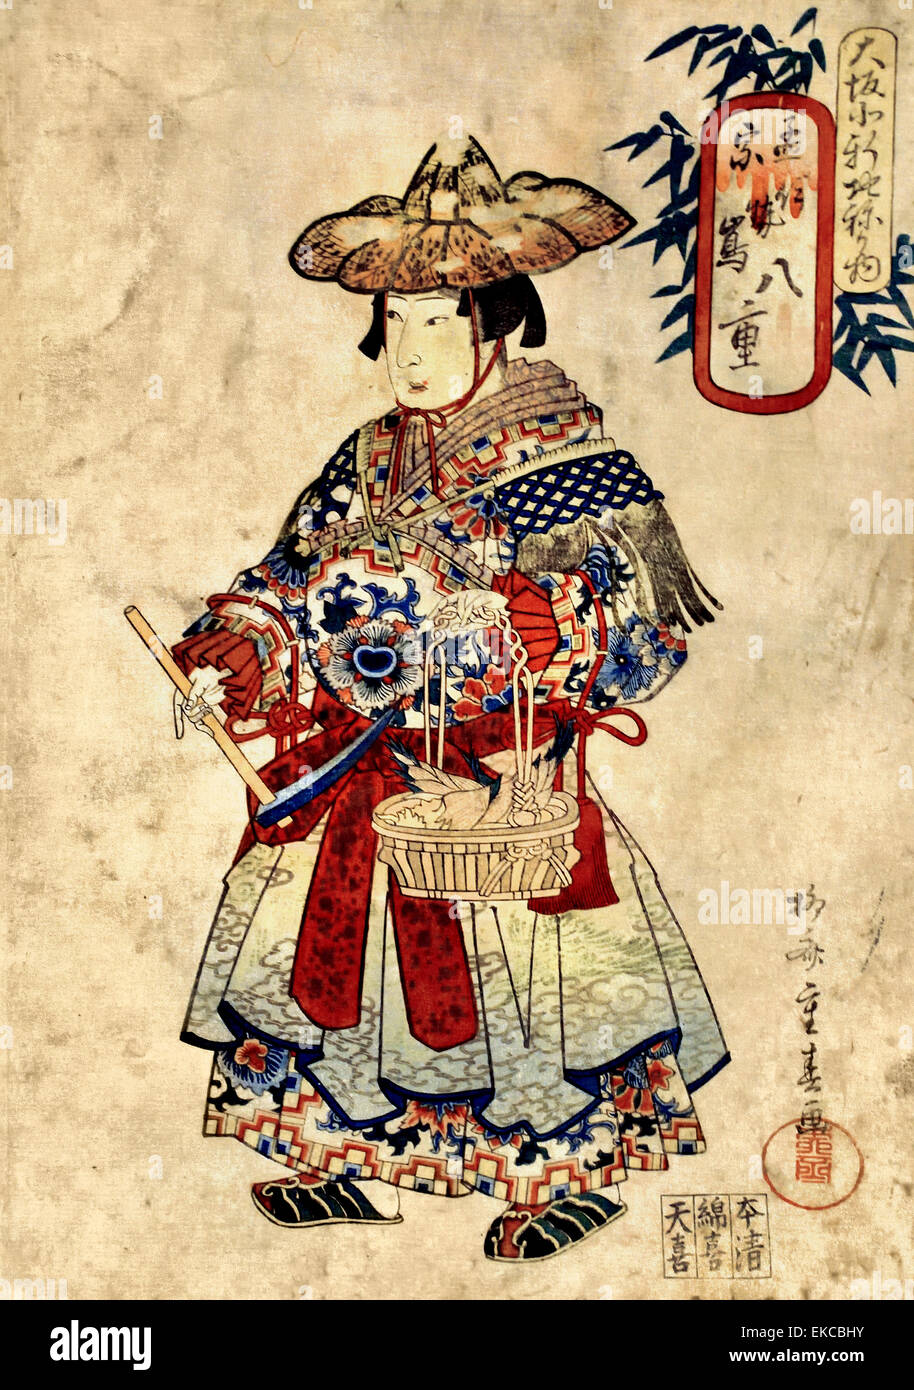 La niña desde 1834 Ryūsai Kotoma Akahiya Shigeharu (1802-1853) fue un japonés con sede en Osaka de xilografía Imagen De Stock